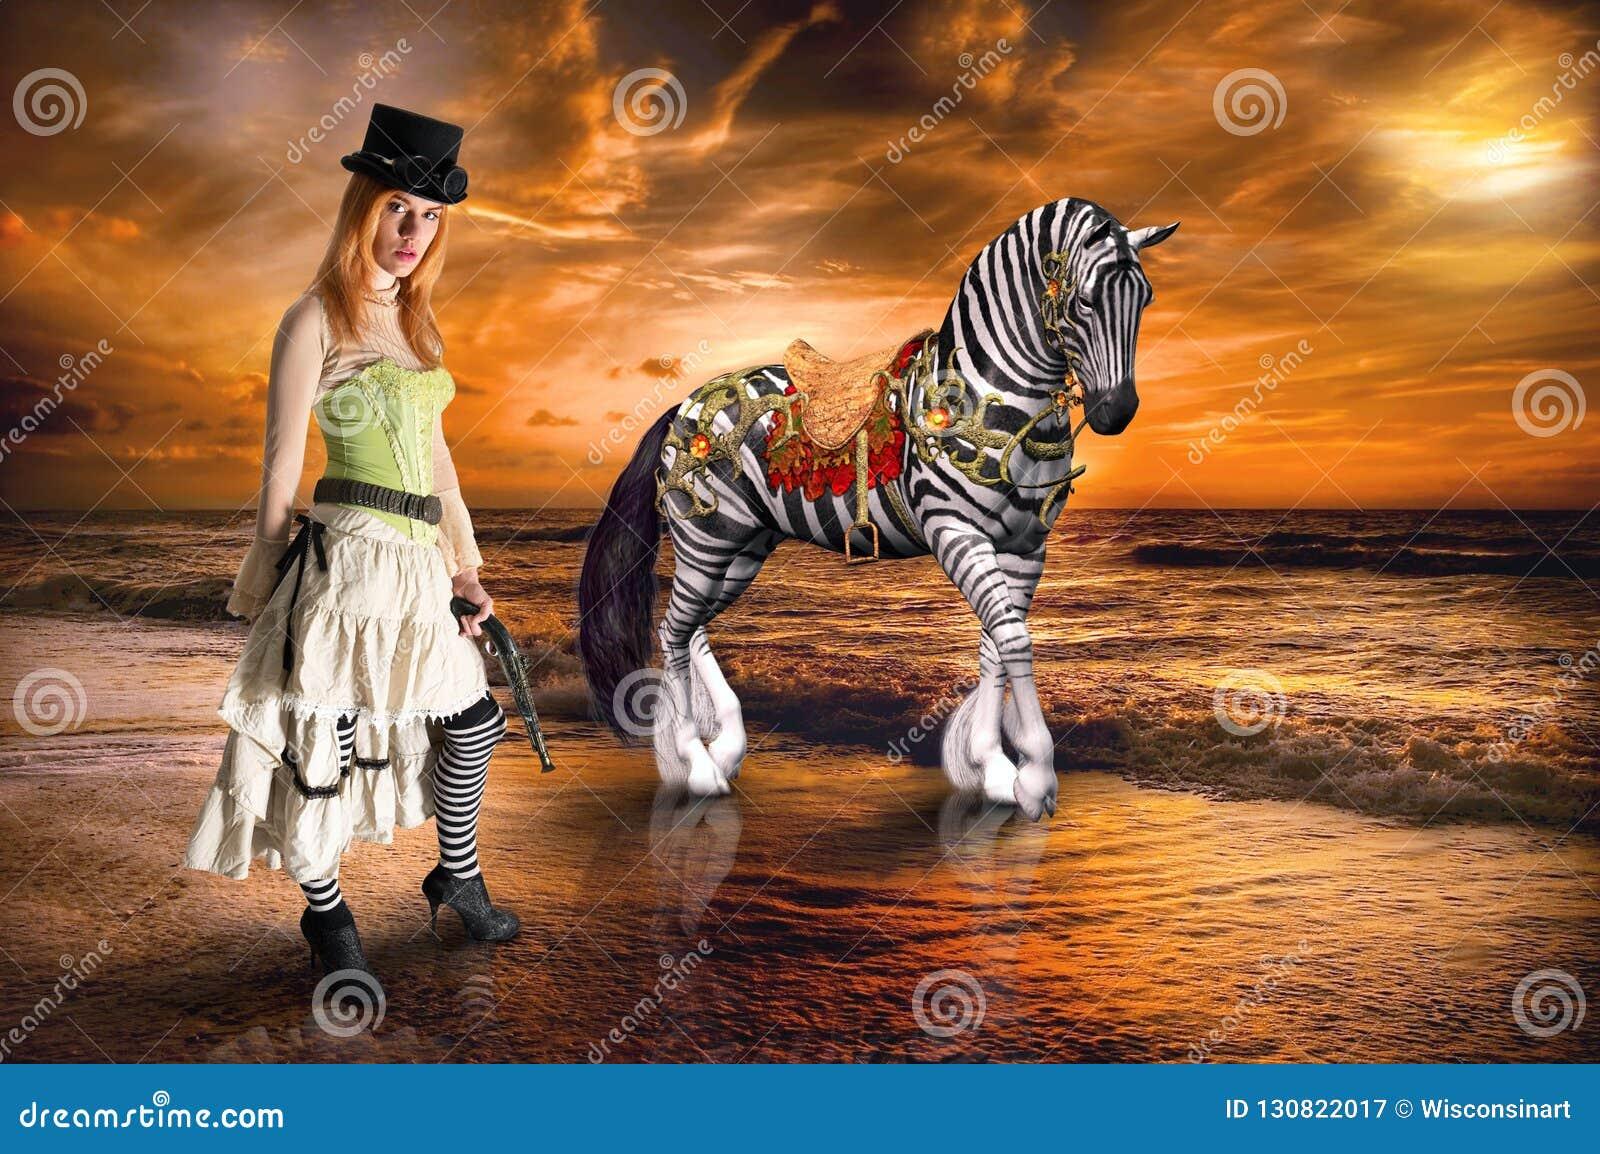 Surreal Steampunk Woman, Zebra, Fantasy, Imagination